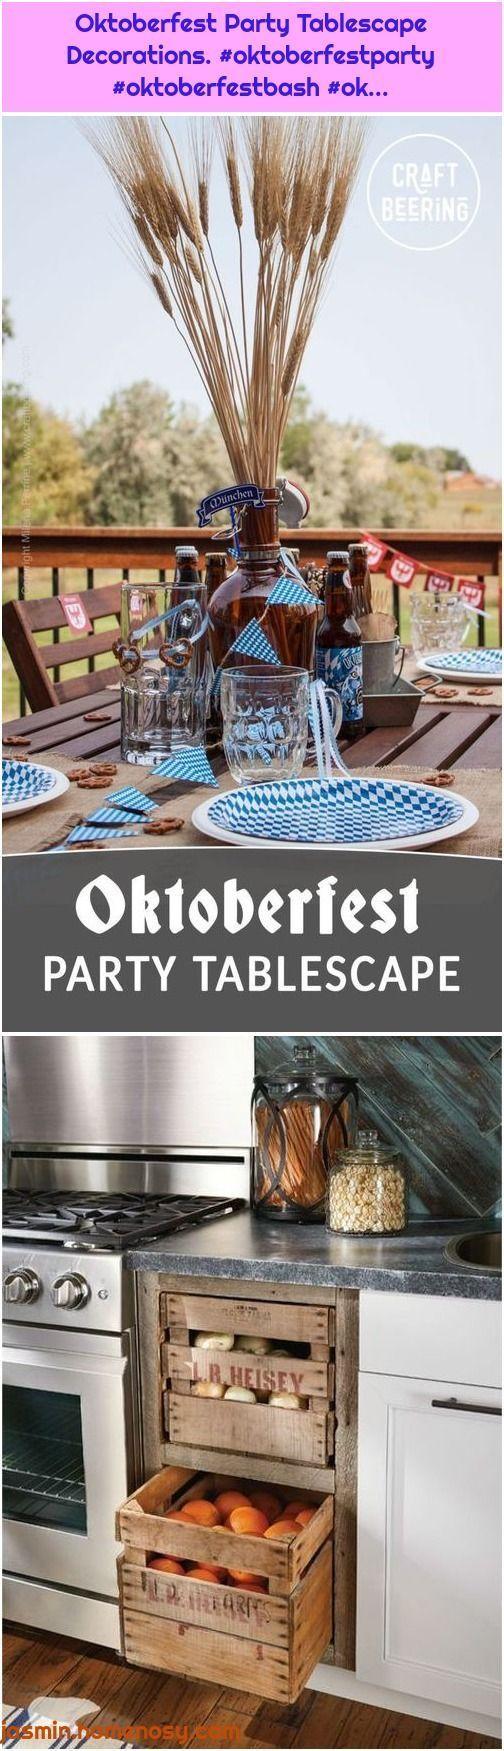 Oktoberfest Party Tablescape Dekorationen O Oktoberfest Party O